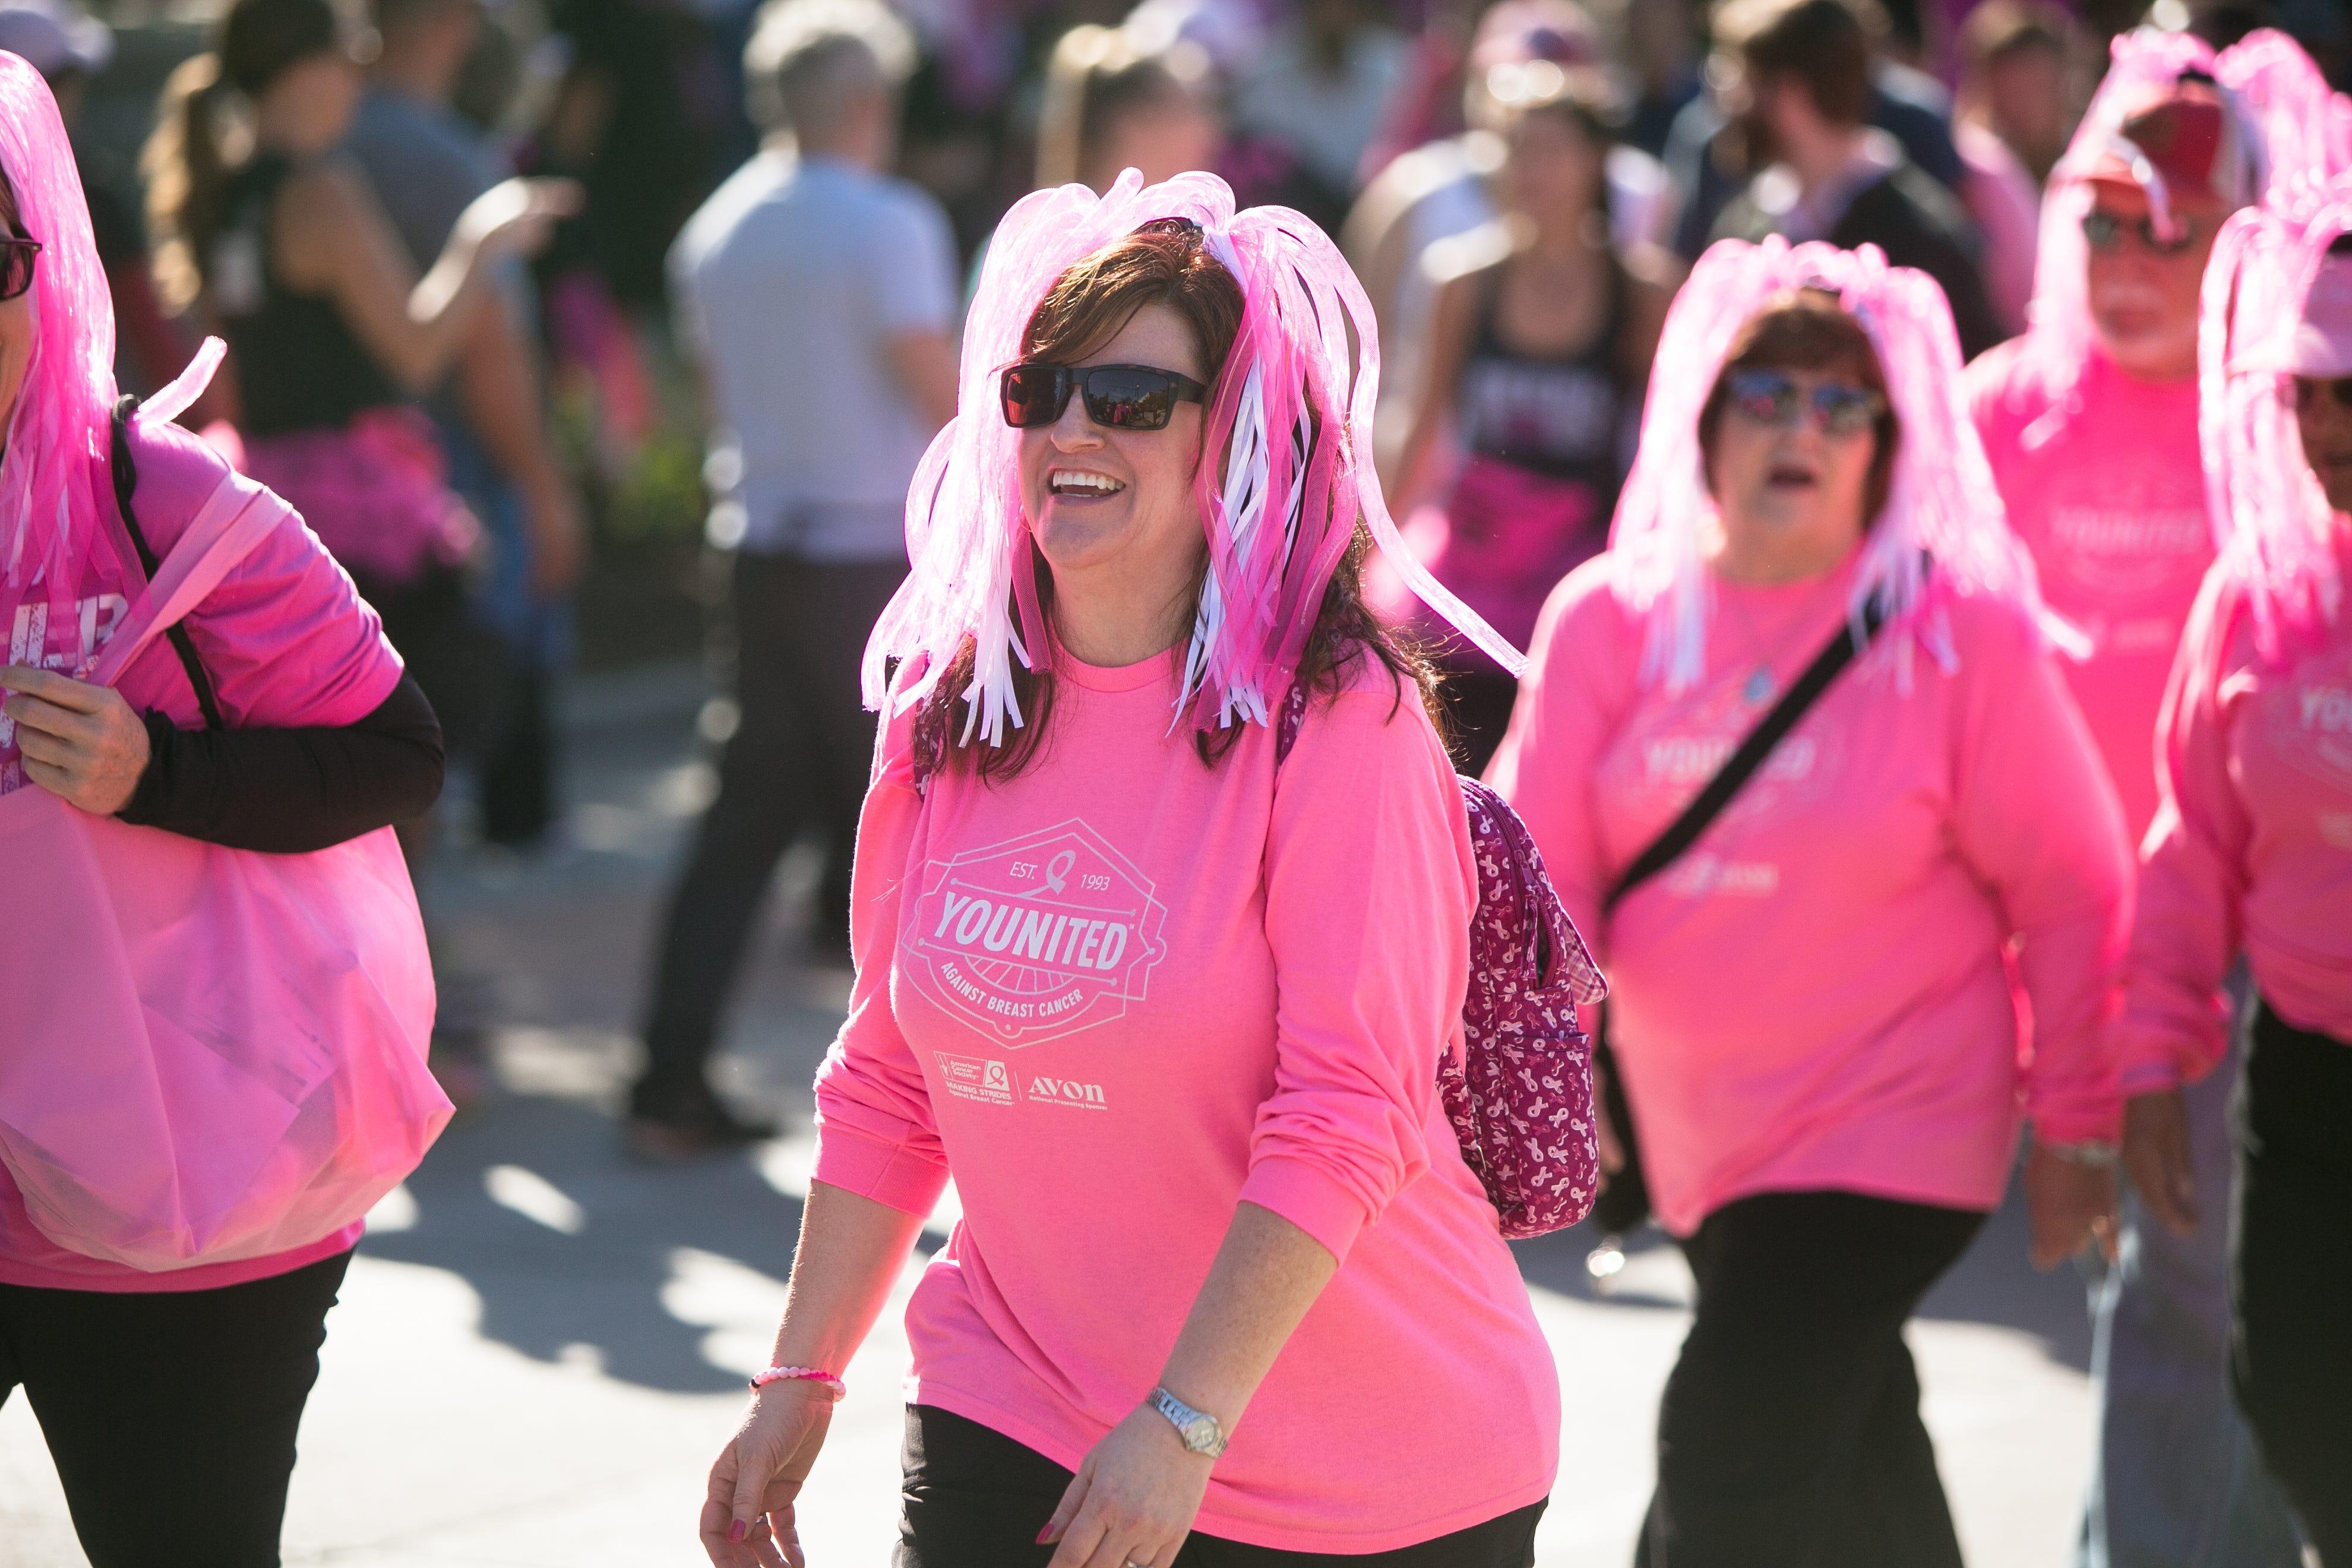 Making Strides Against Breast Cancer walk in Asheville